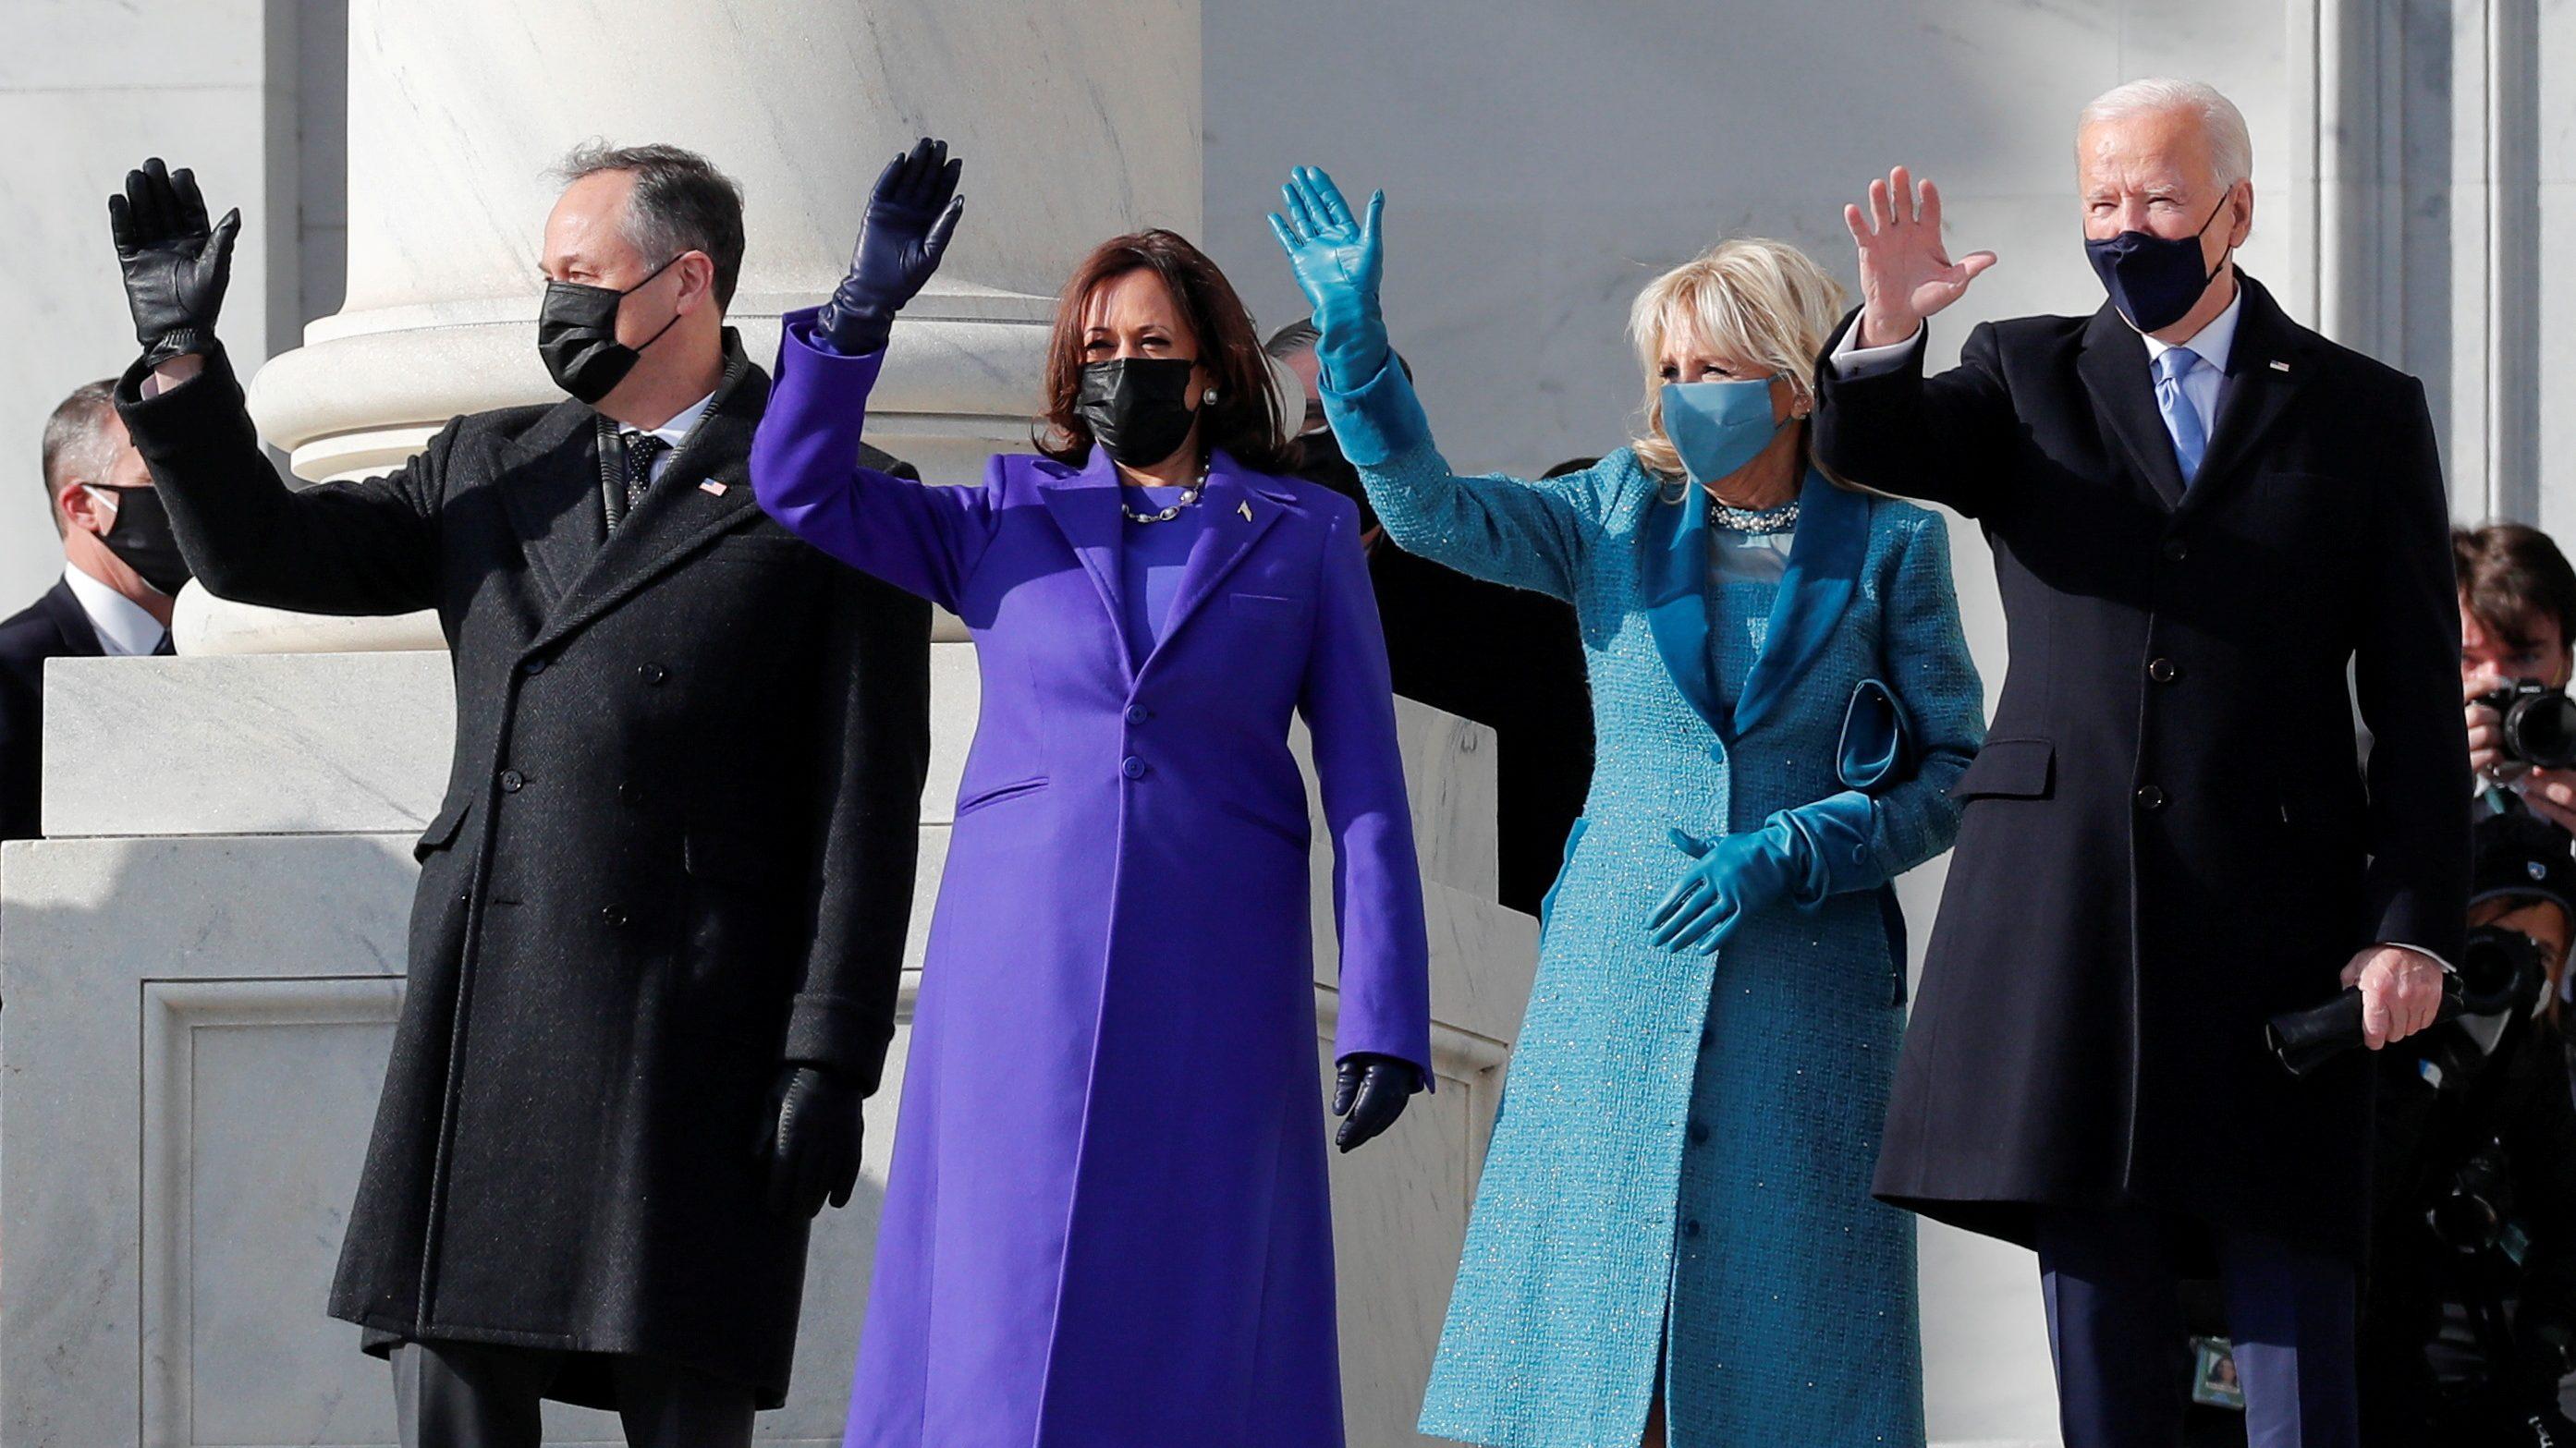 TOOLOUD Joe Biden for President Adult Wear Around Night Shirt and Dress